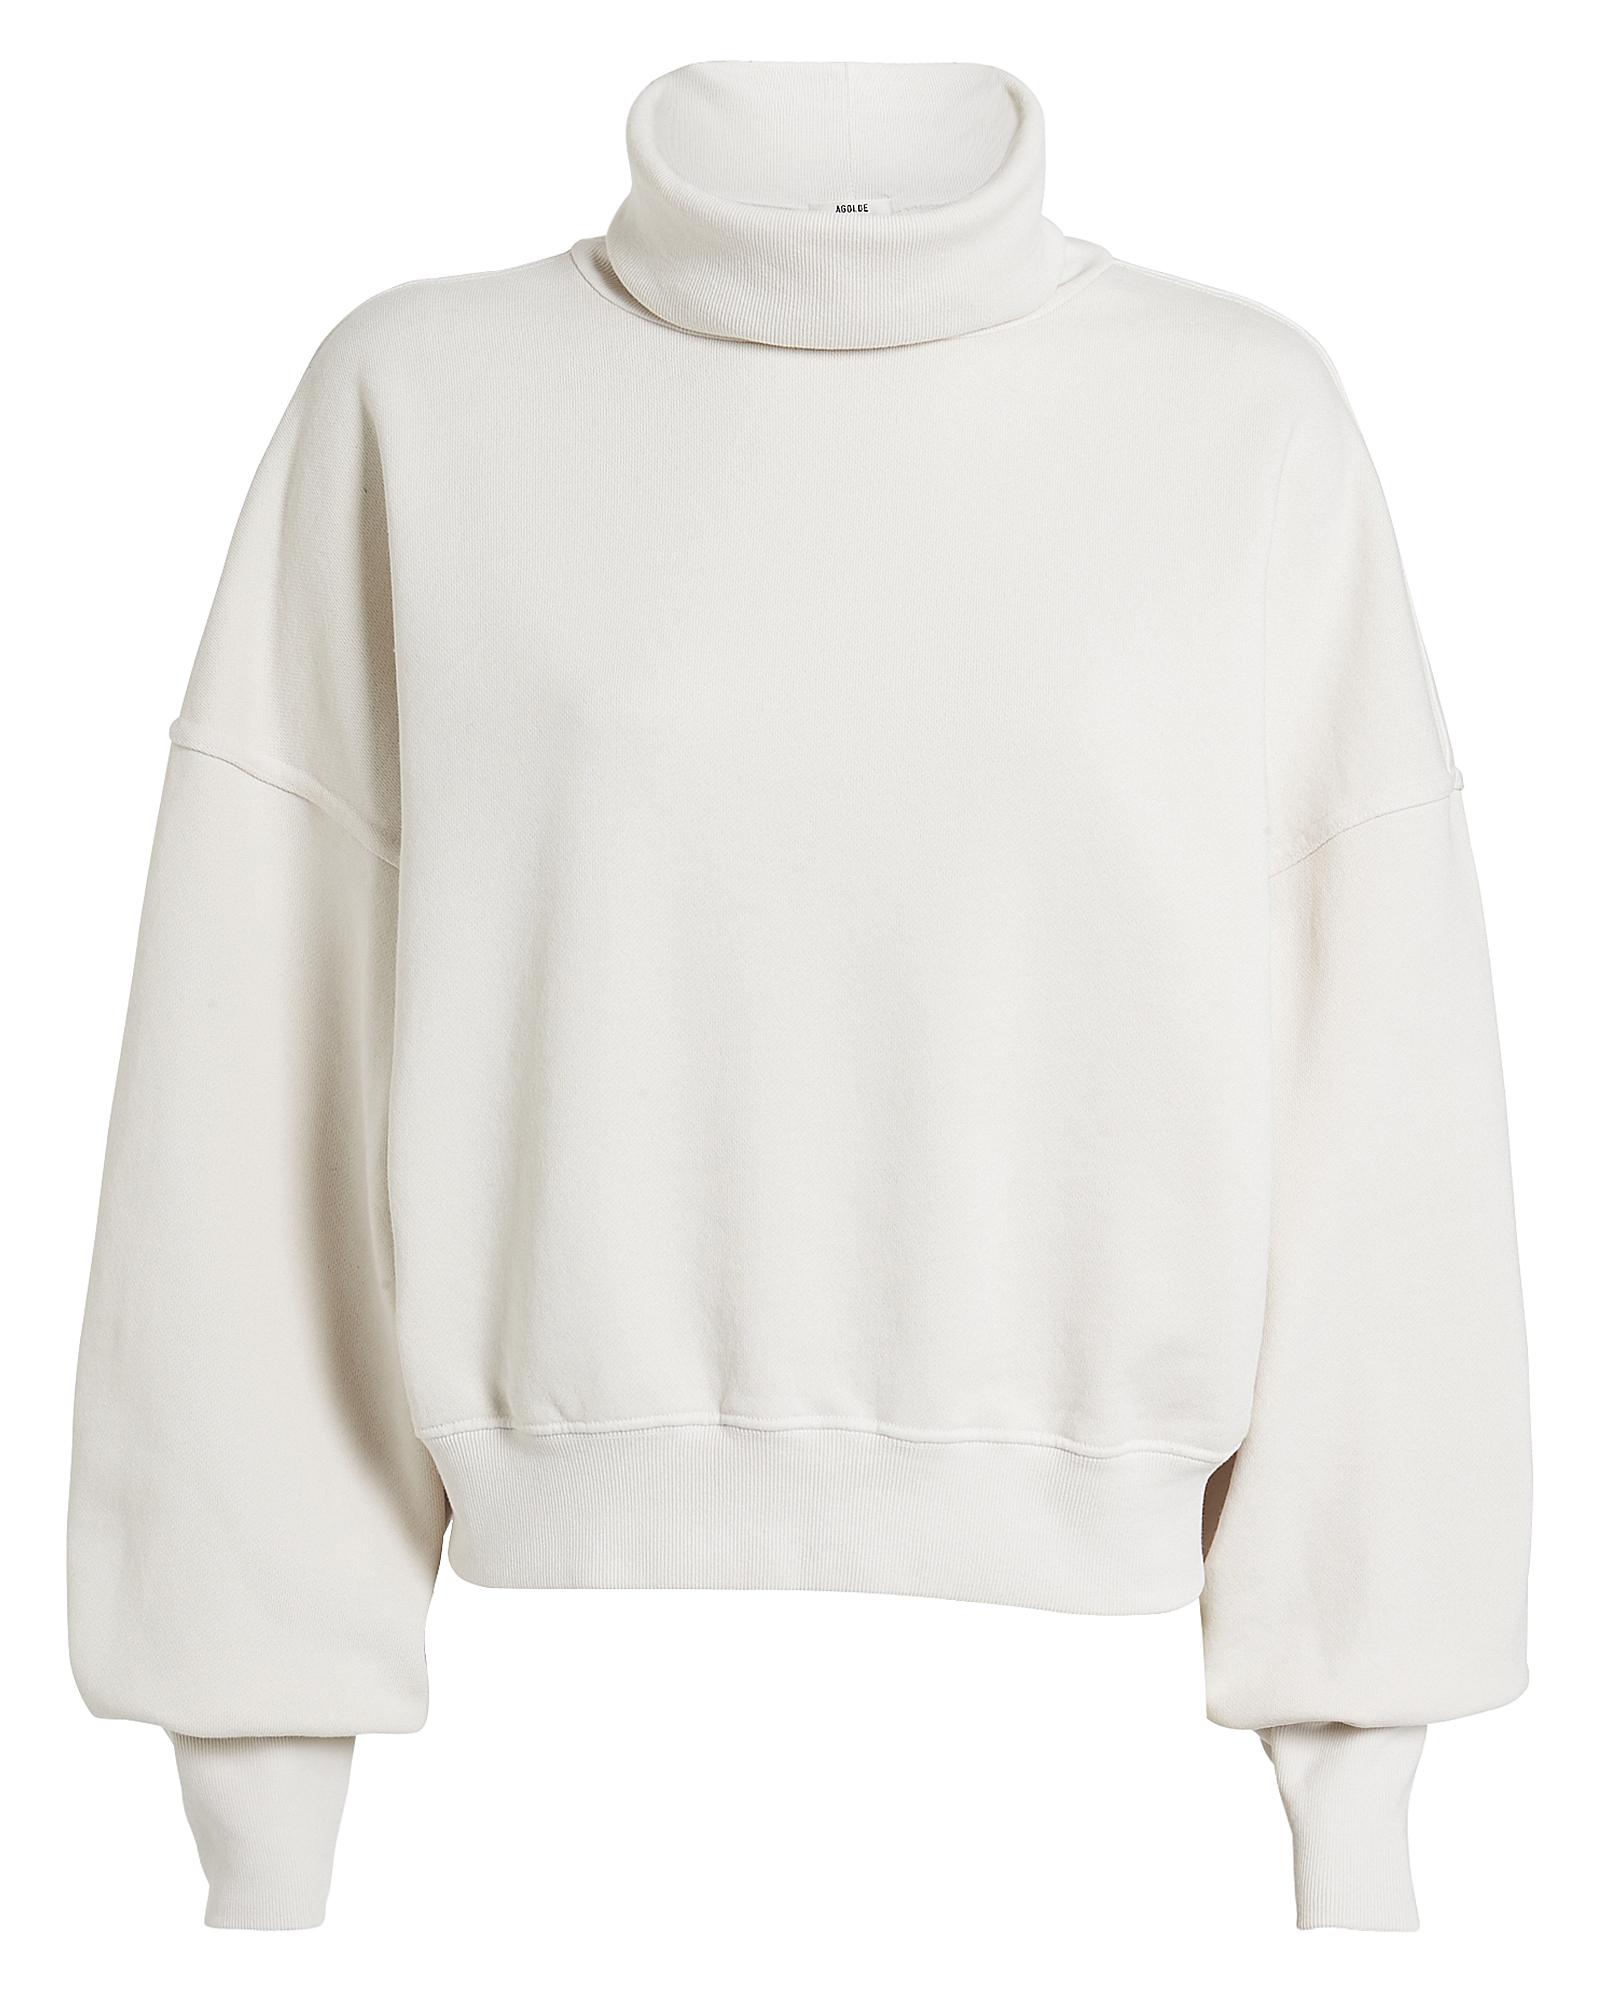 Agolde T-shirts AGOLDE BALLOON SLEEVE TURTLENECK SWEATSHIRT